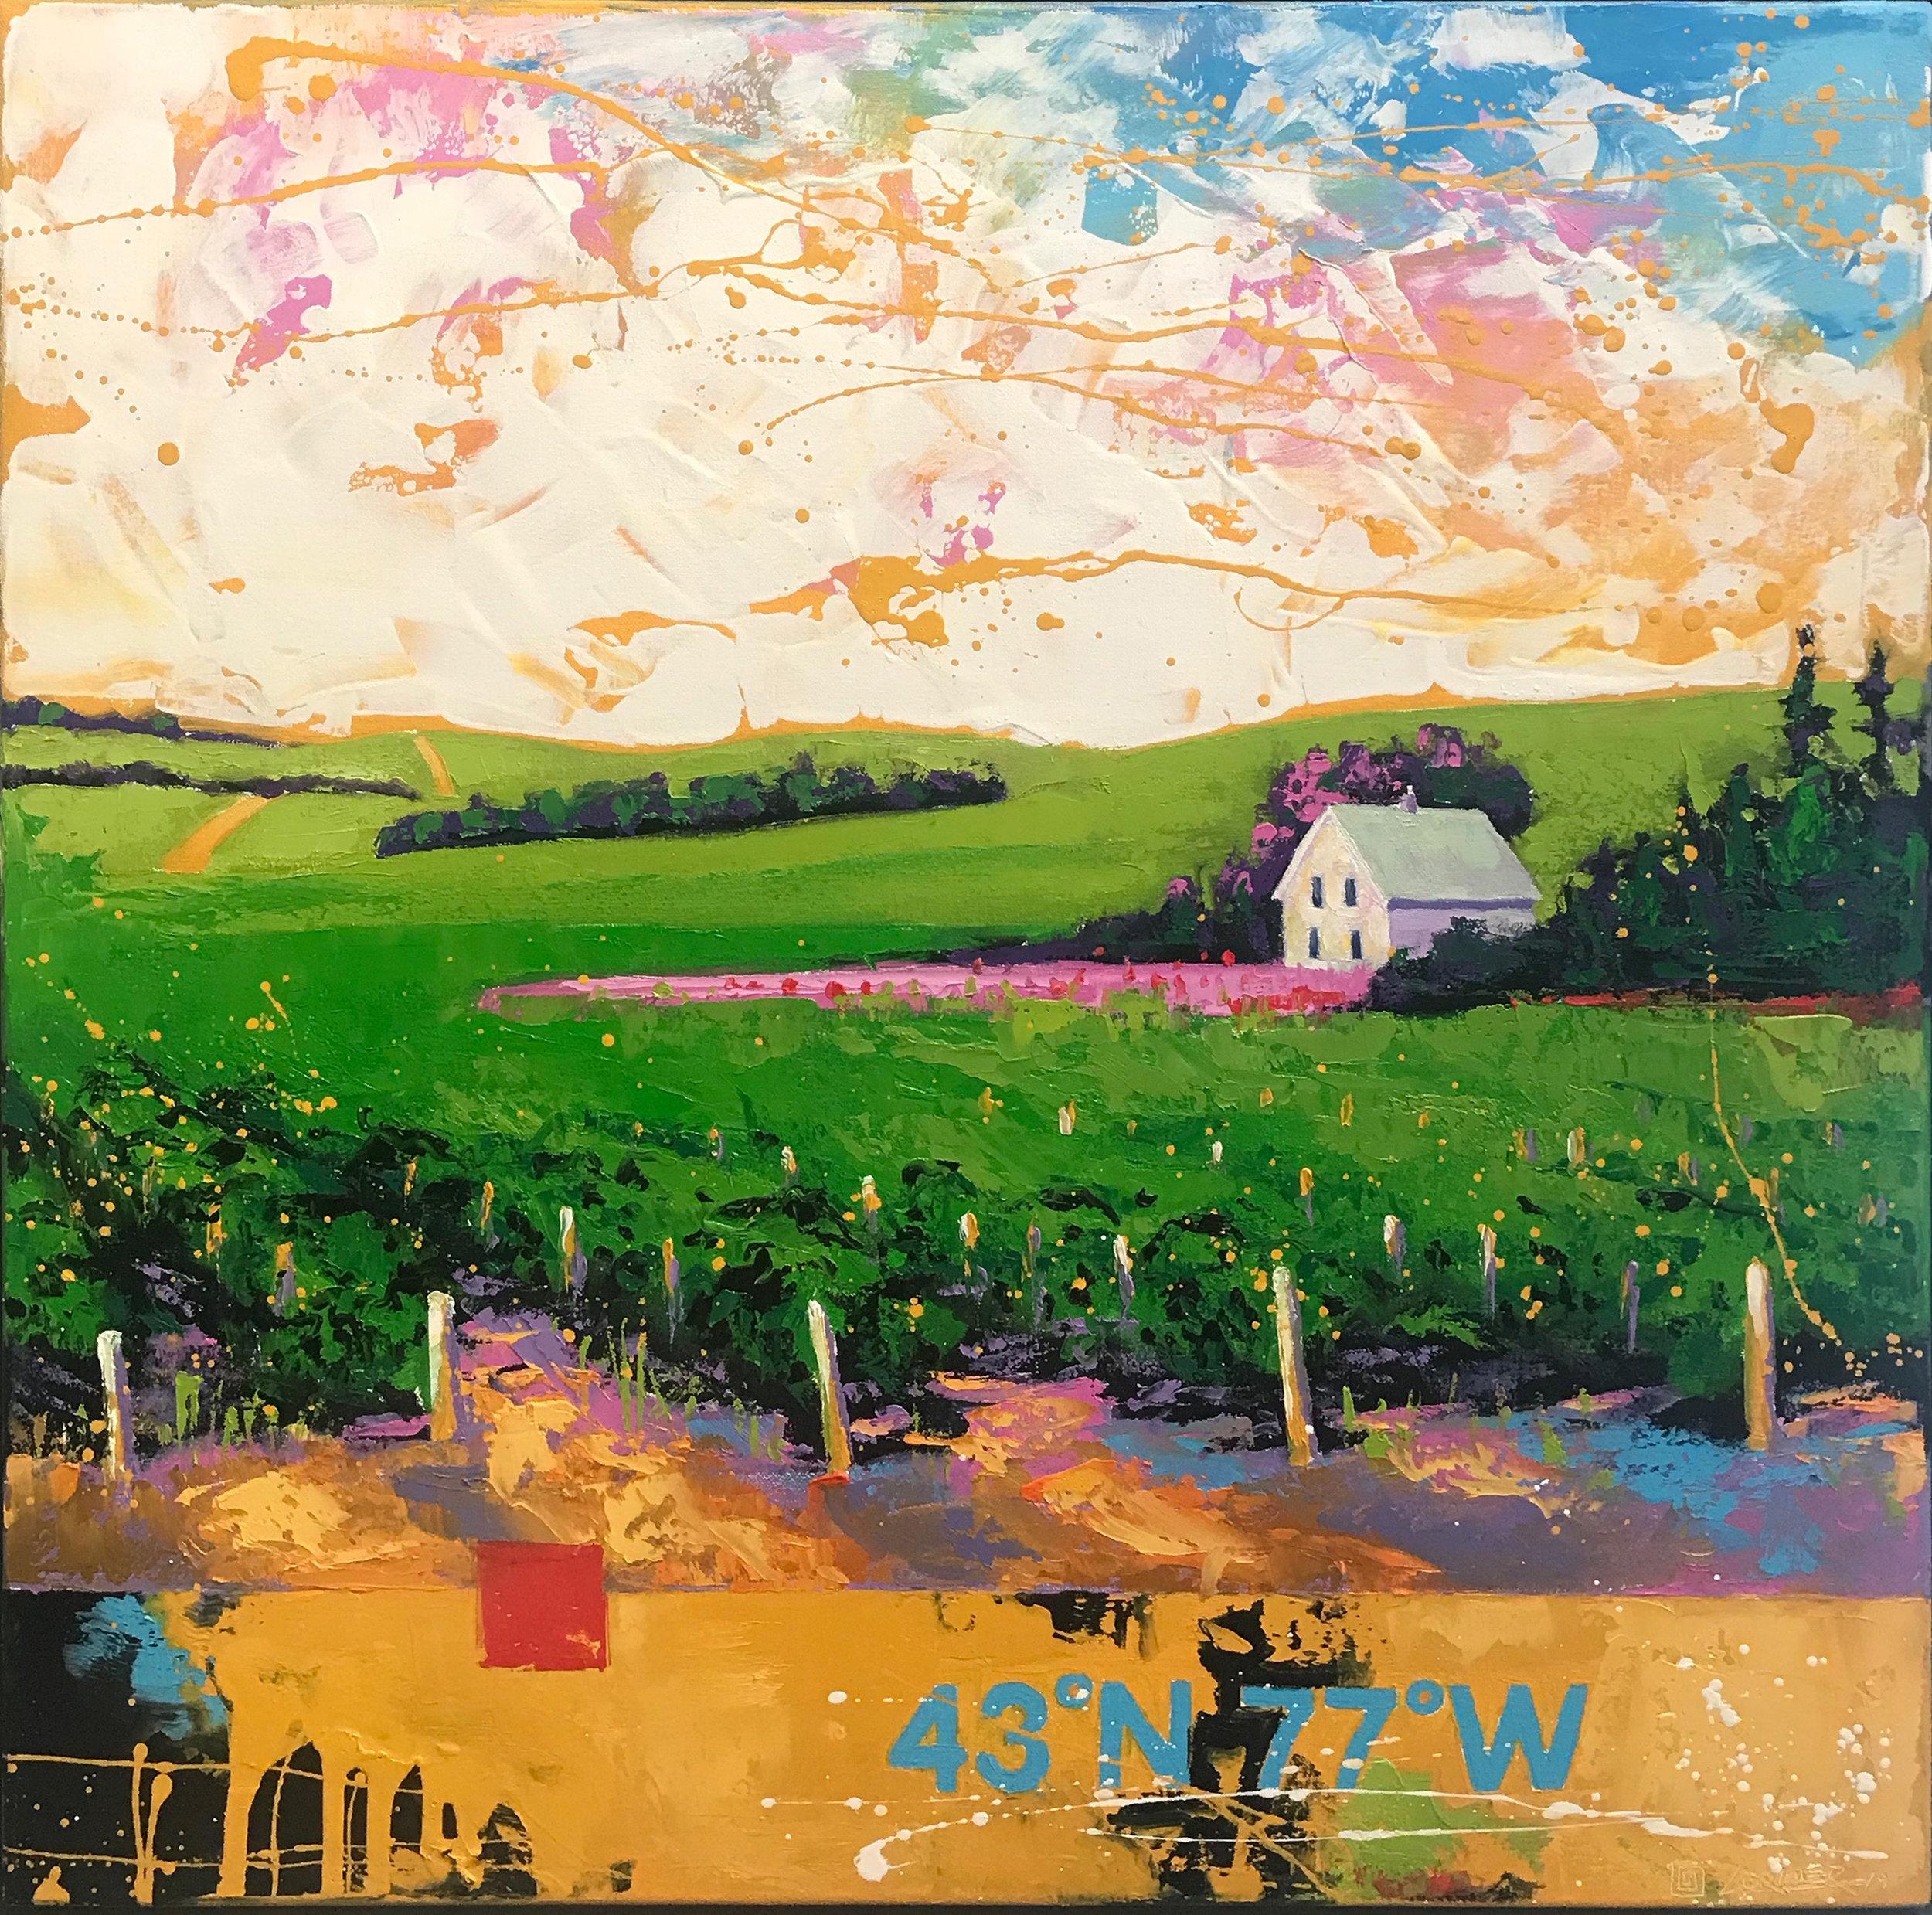 "43º77ºW - PEC WINE COUNTRY (24"" x 24"")"